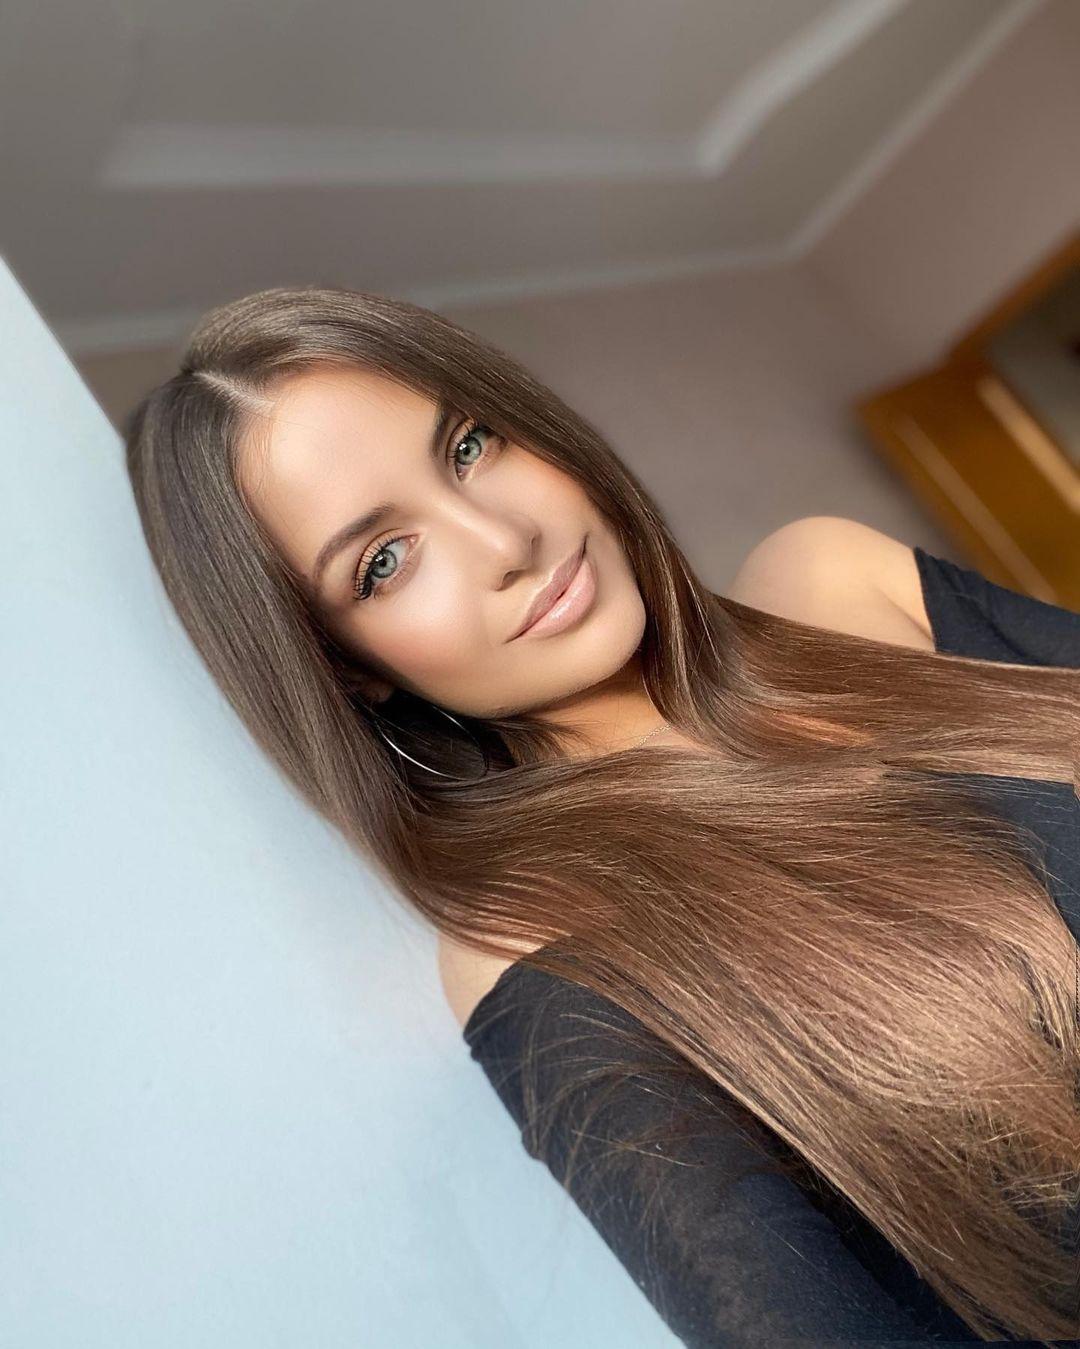 Alena-Gogoleva-Wallpapers-Insta-Fit-Bio-4